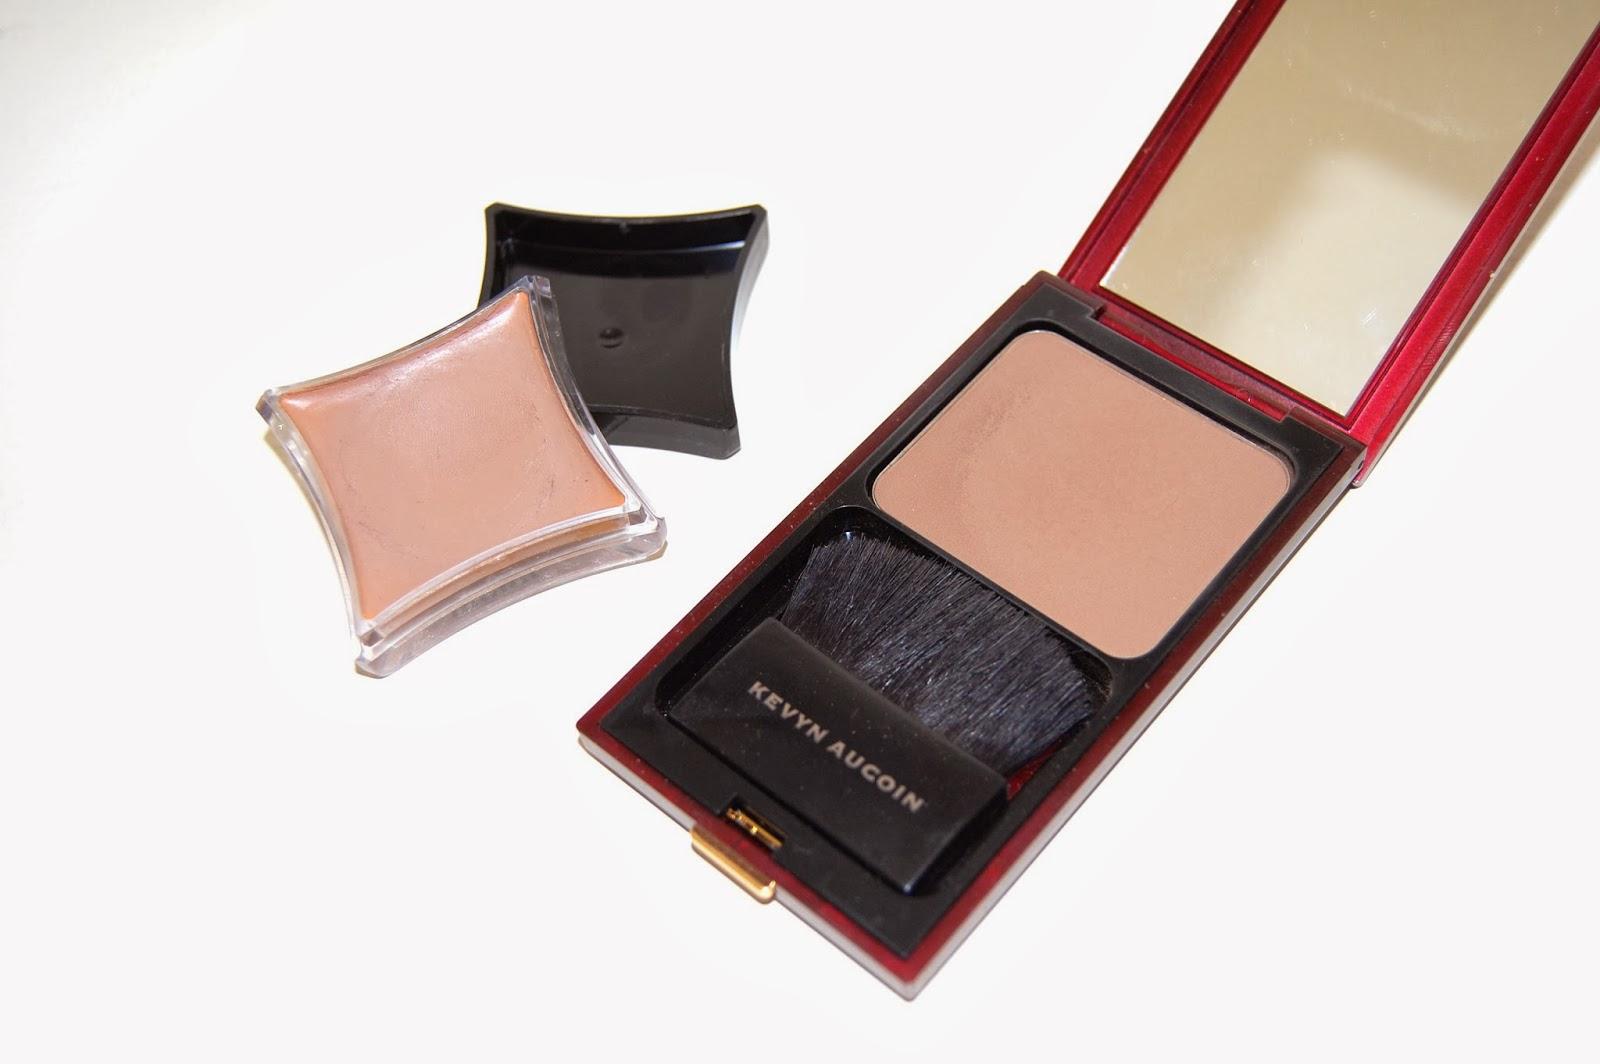 chelsea wears pale skin contour products illamasqua cream pigment